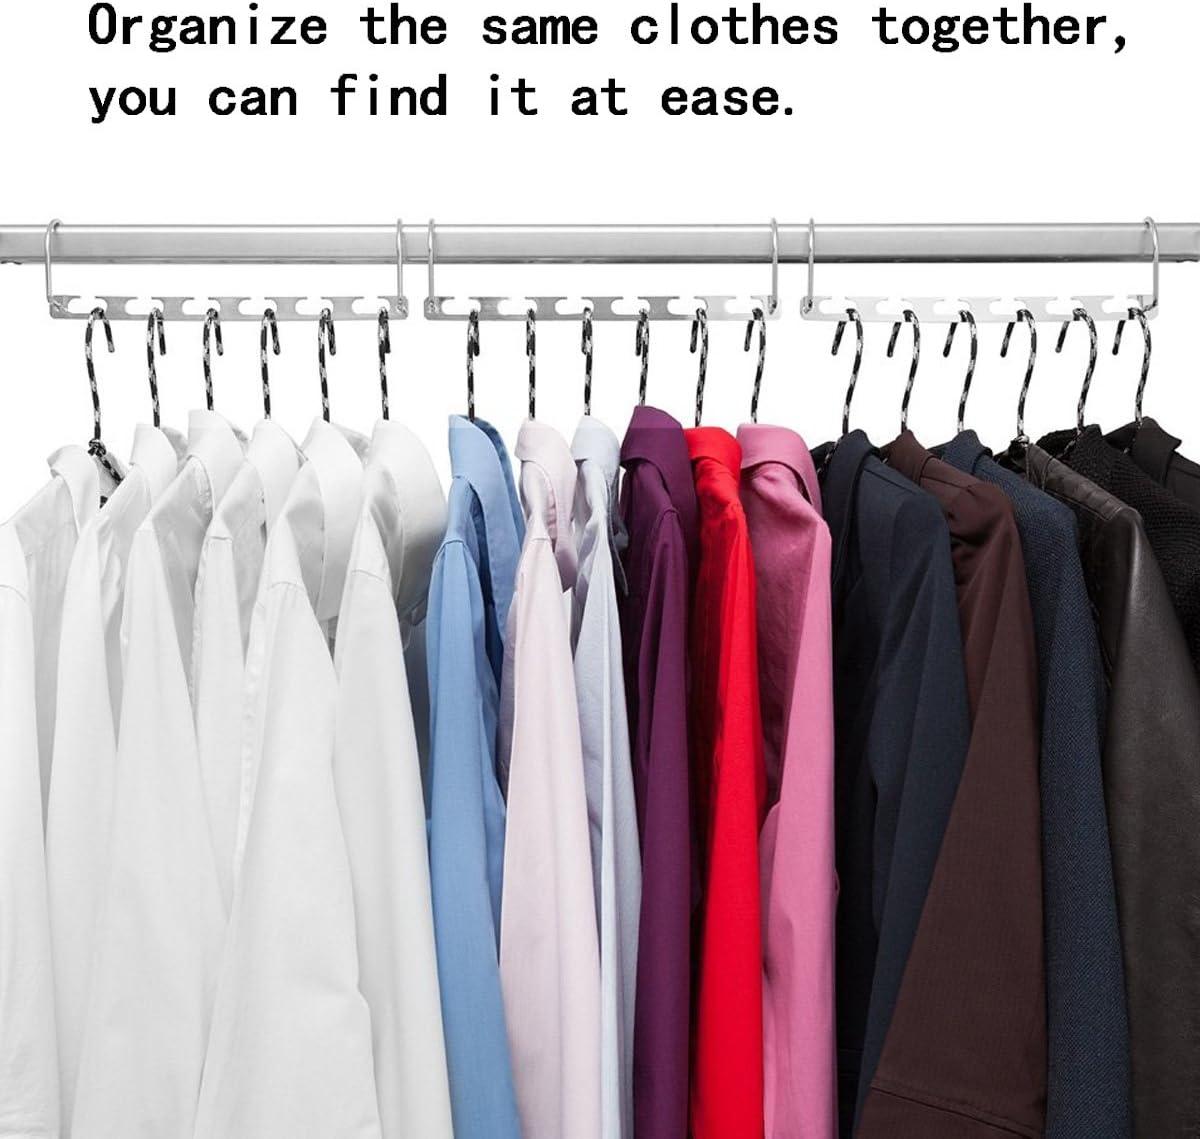 2pcs Metal Cascading Wonder Hangers Space Saver Closet Organizer Clothes Rack